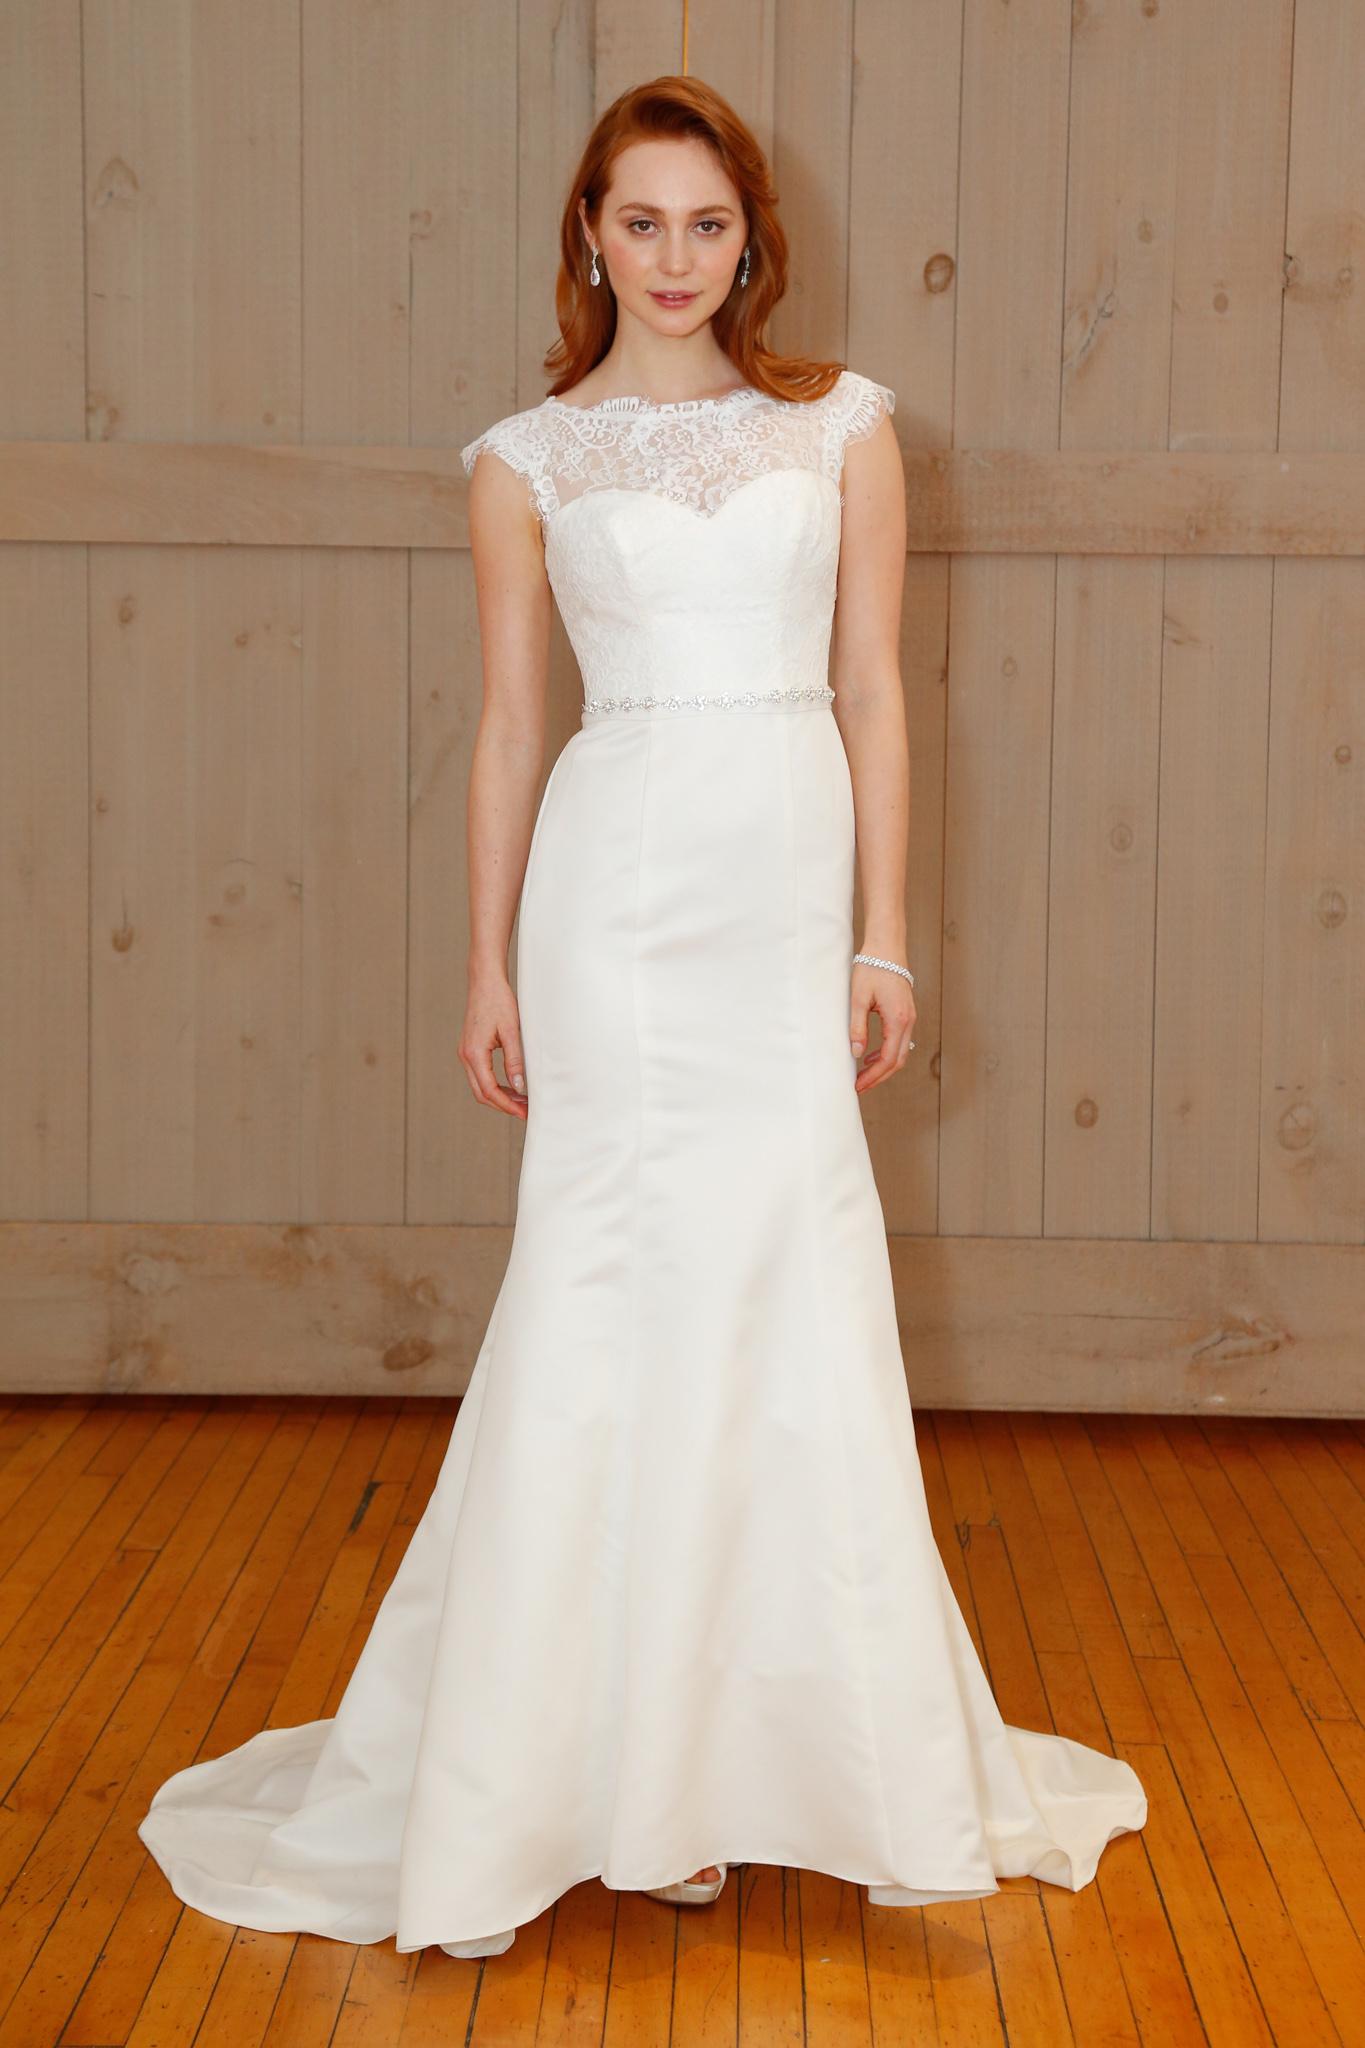 A look from David's Bridal